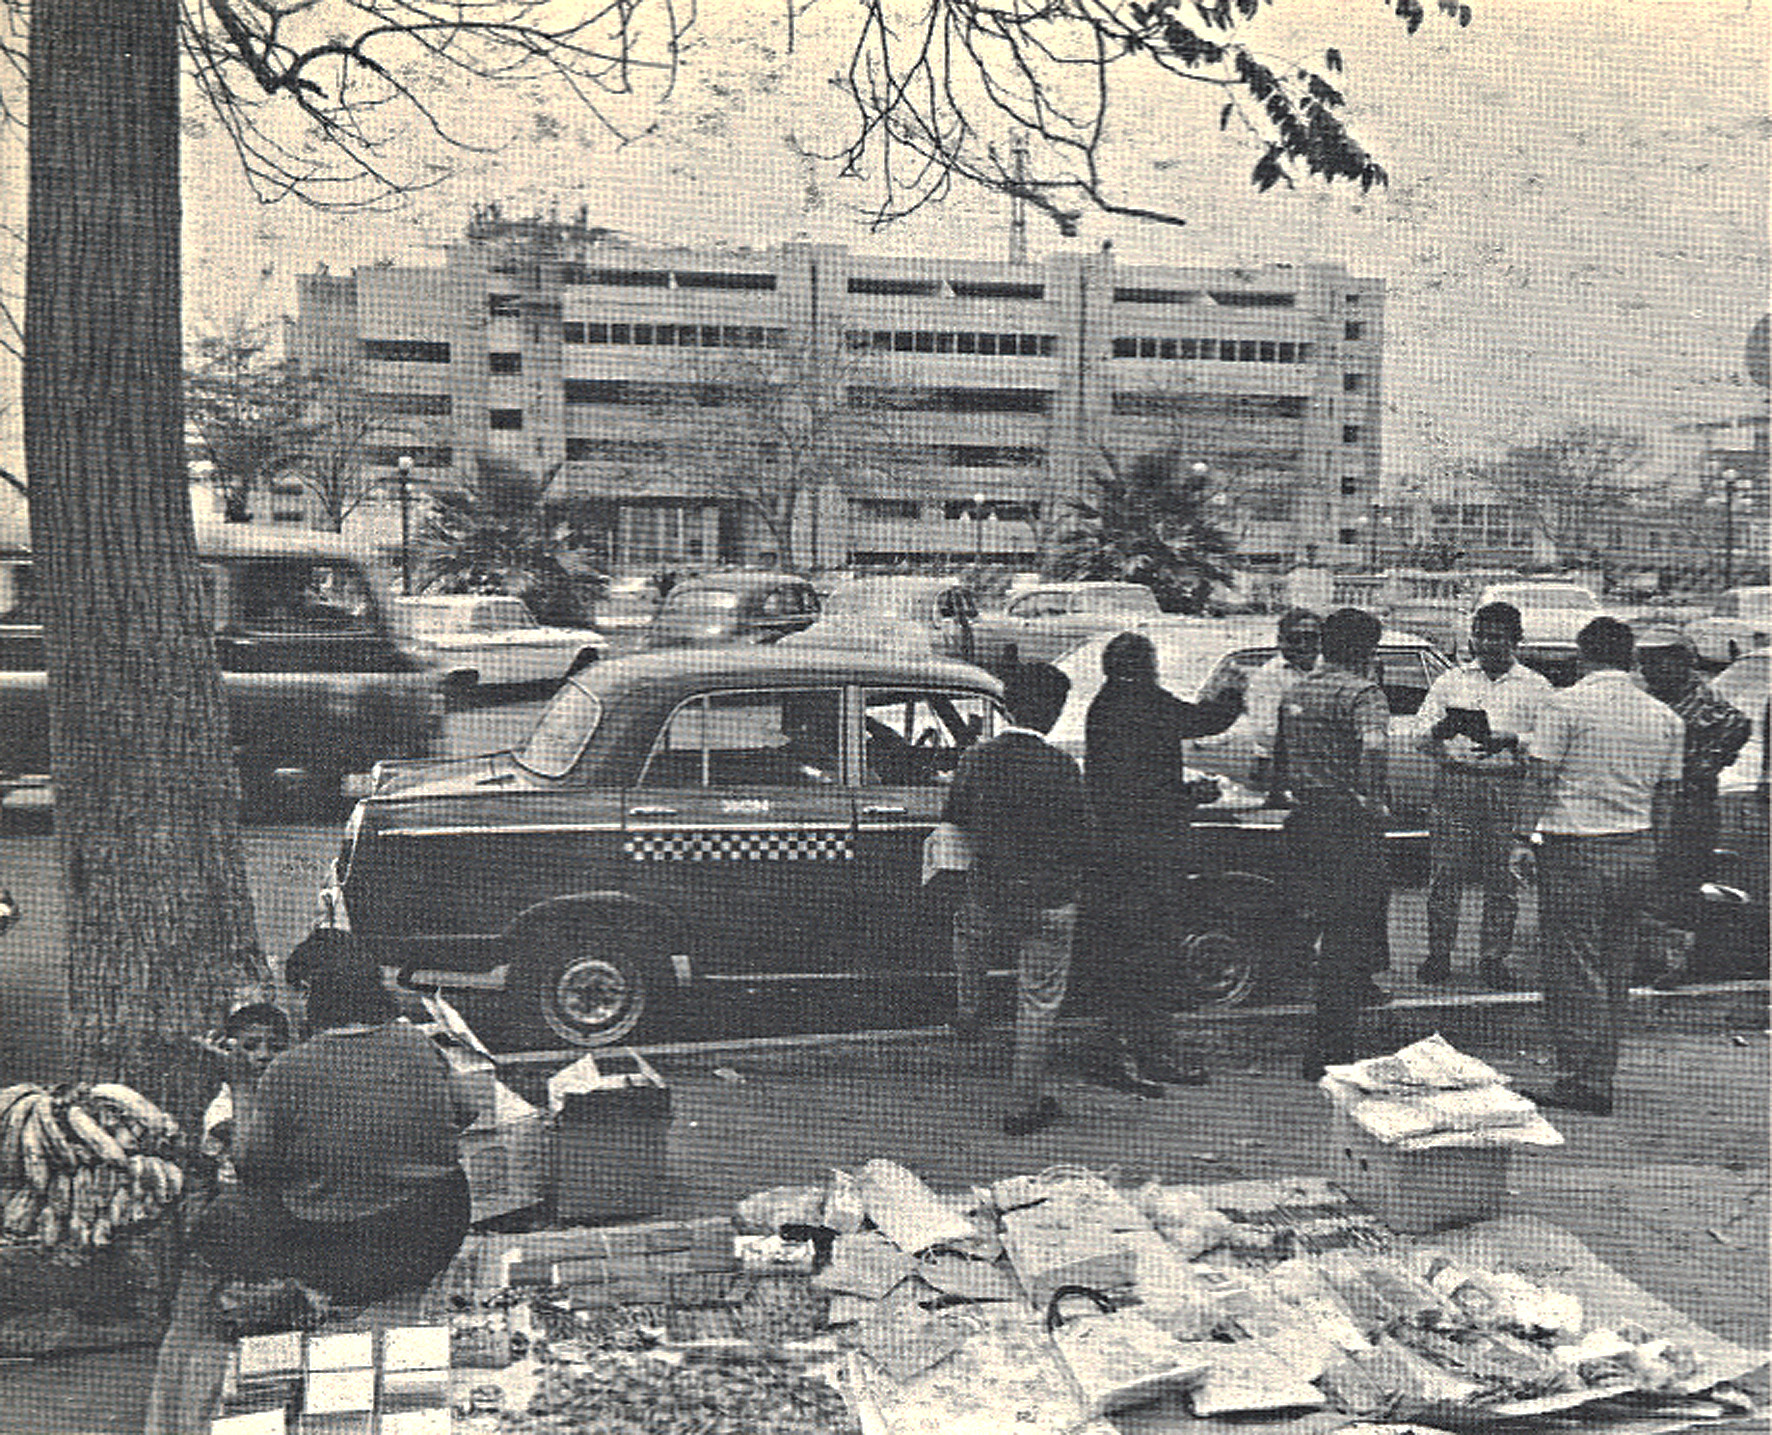 Centro de Lima en 1971. Image © Paolo Gasparini